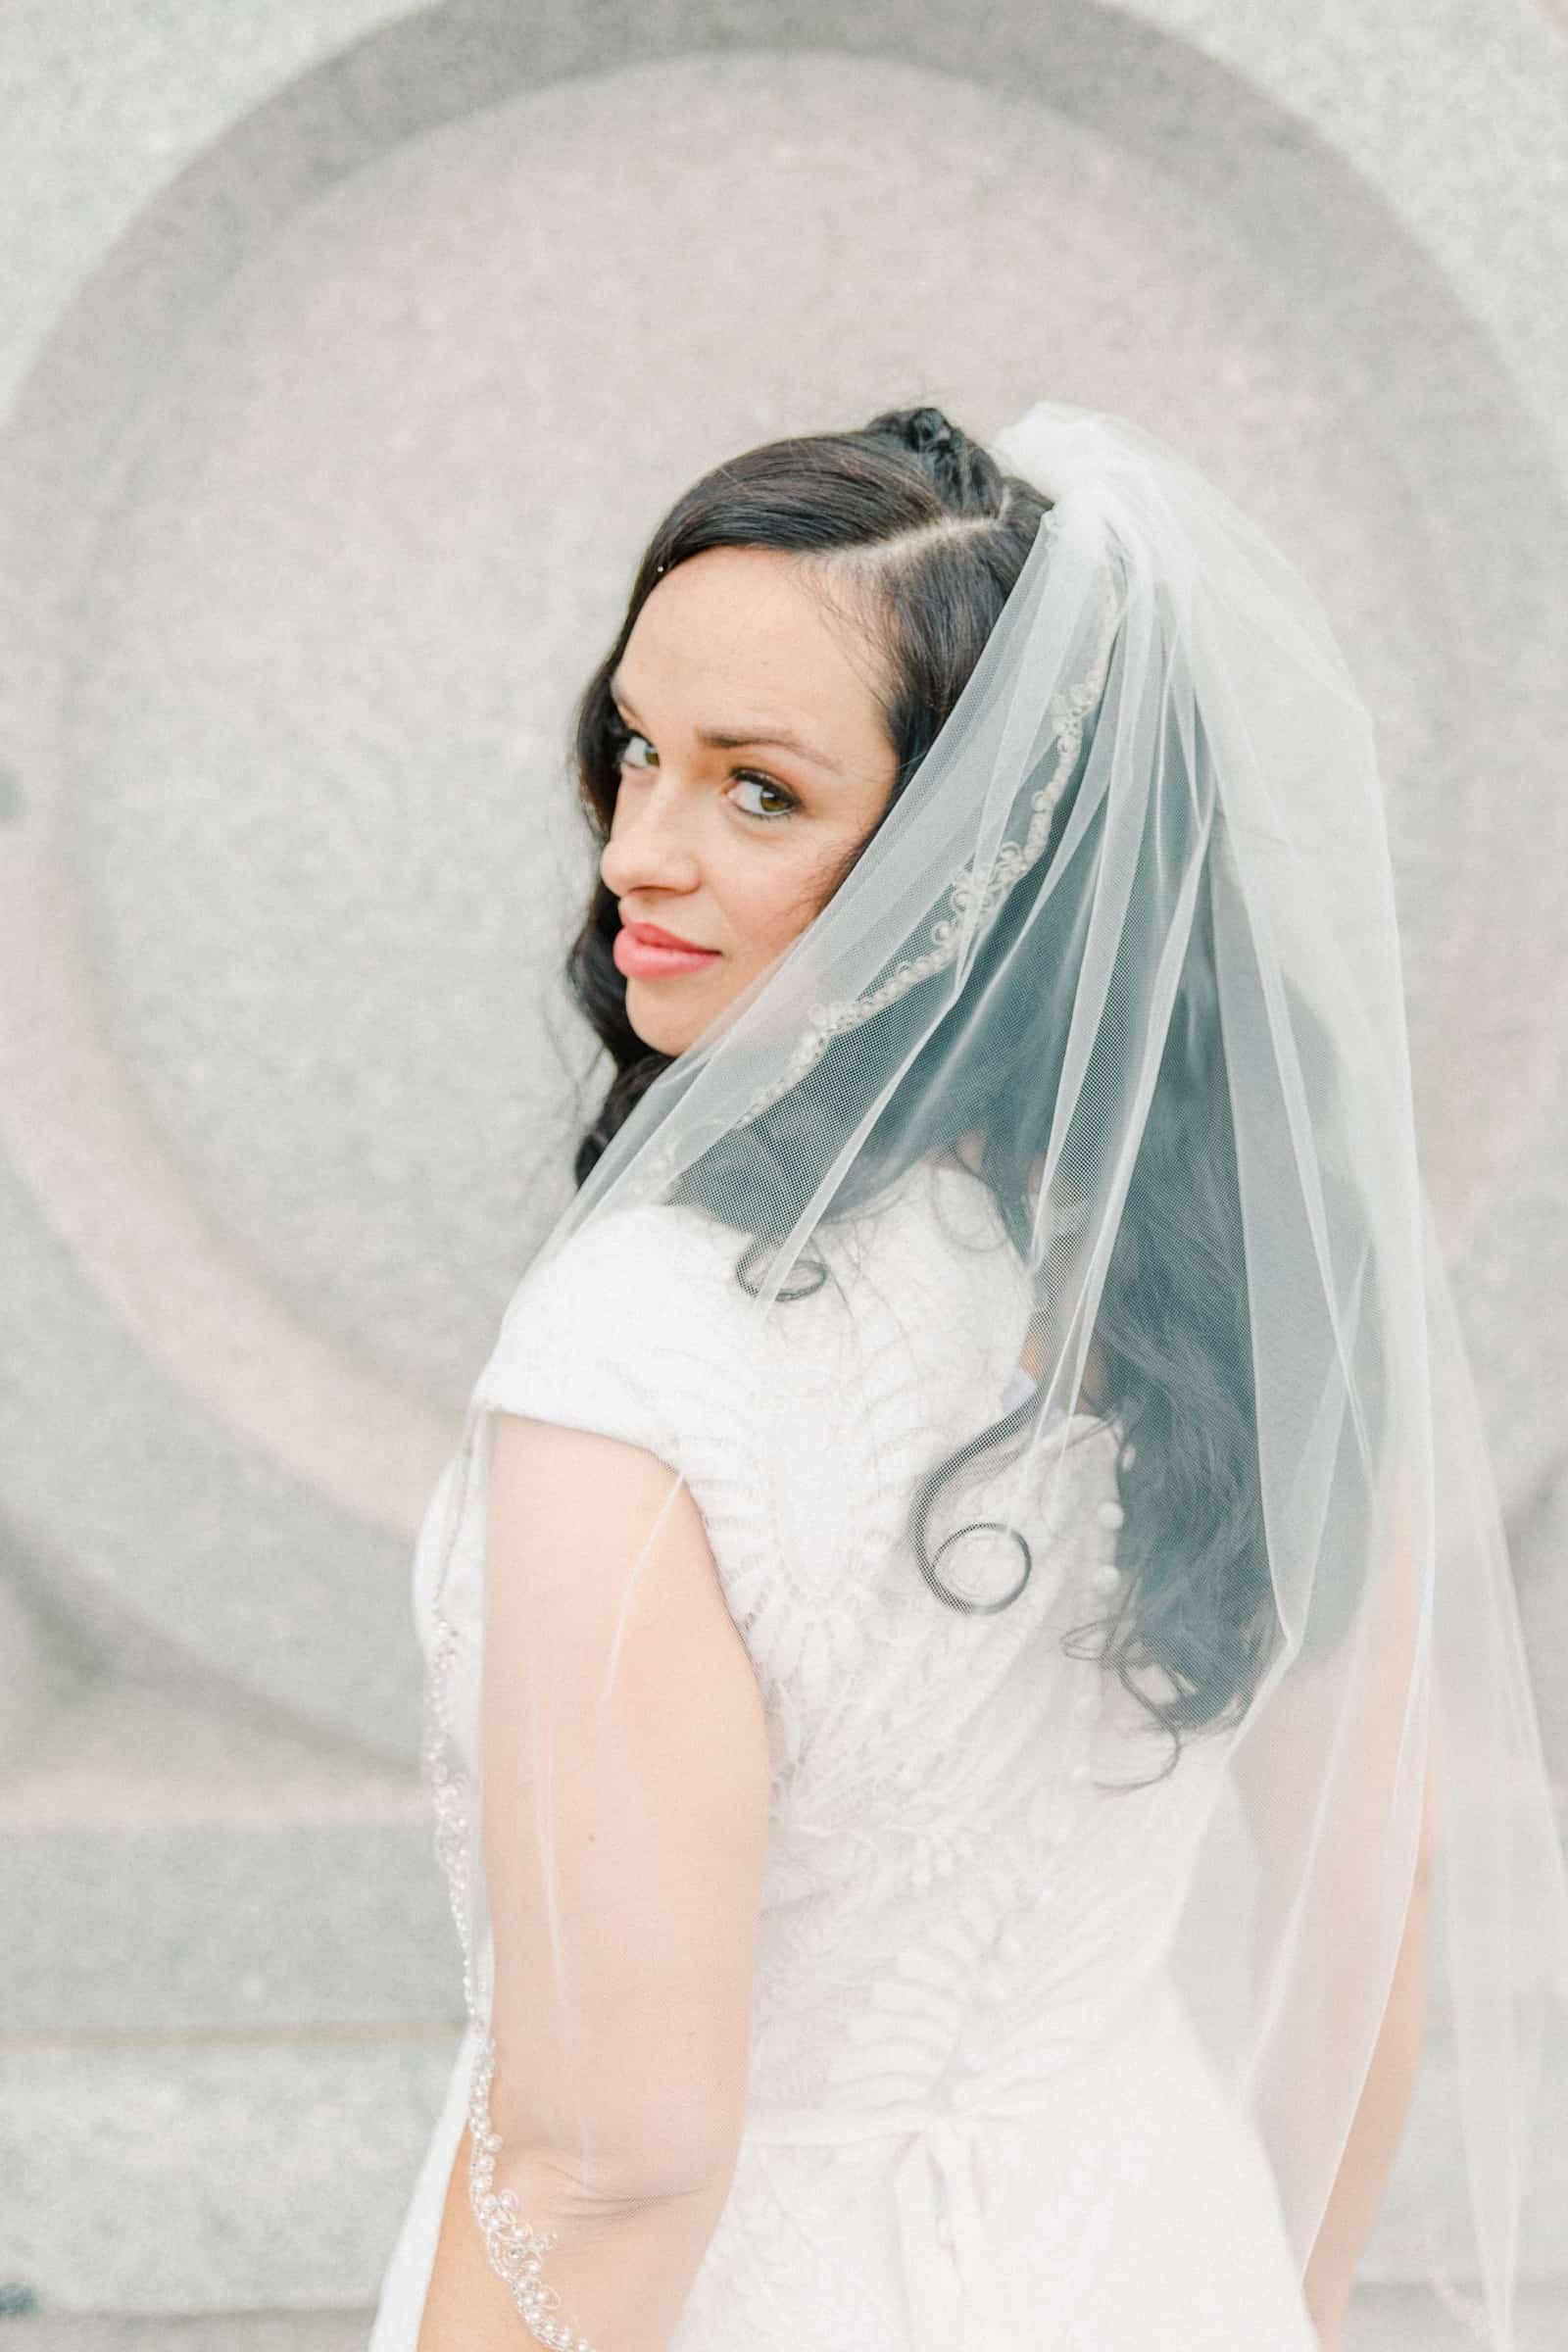 Thomas S. Monson Center Wedding, Salt Lake LDS Temple Wedding, Utah wedding photography. bride in modest lace wedding dress with long fingertip veil